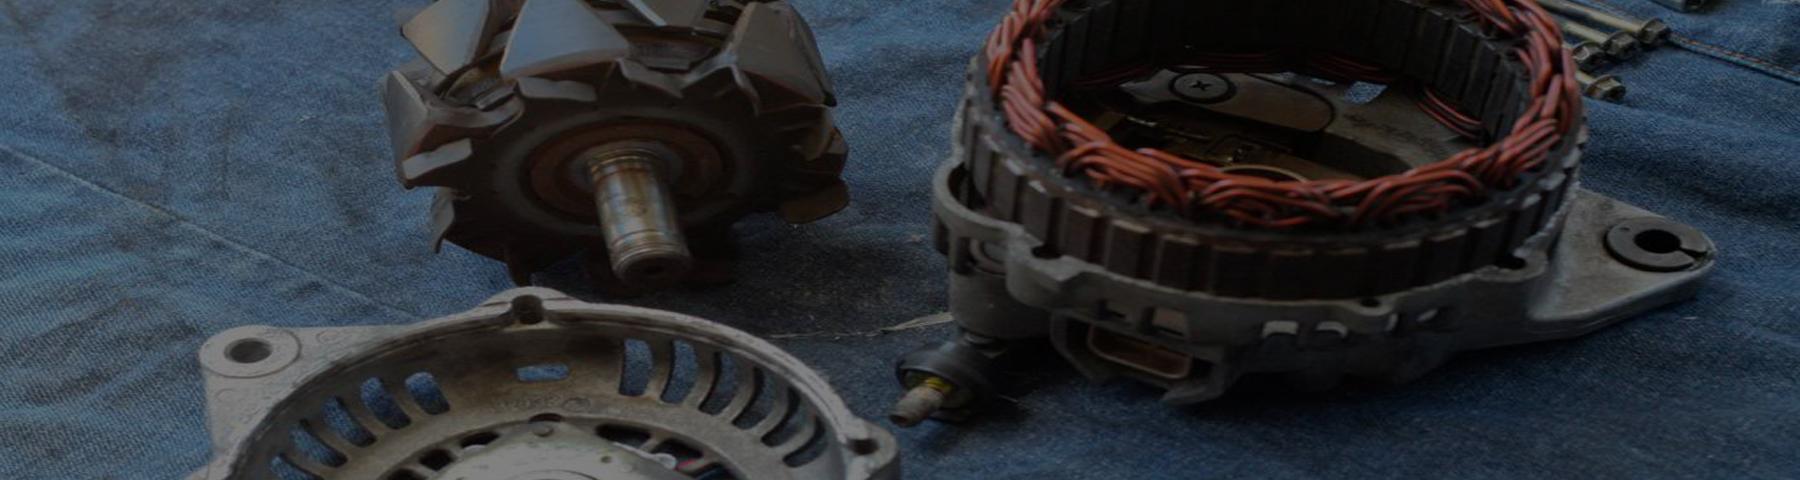 Southern Armature Works - expert auto repair - Birmingham